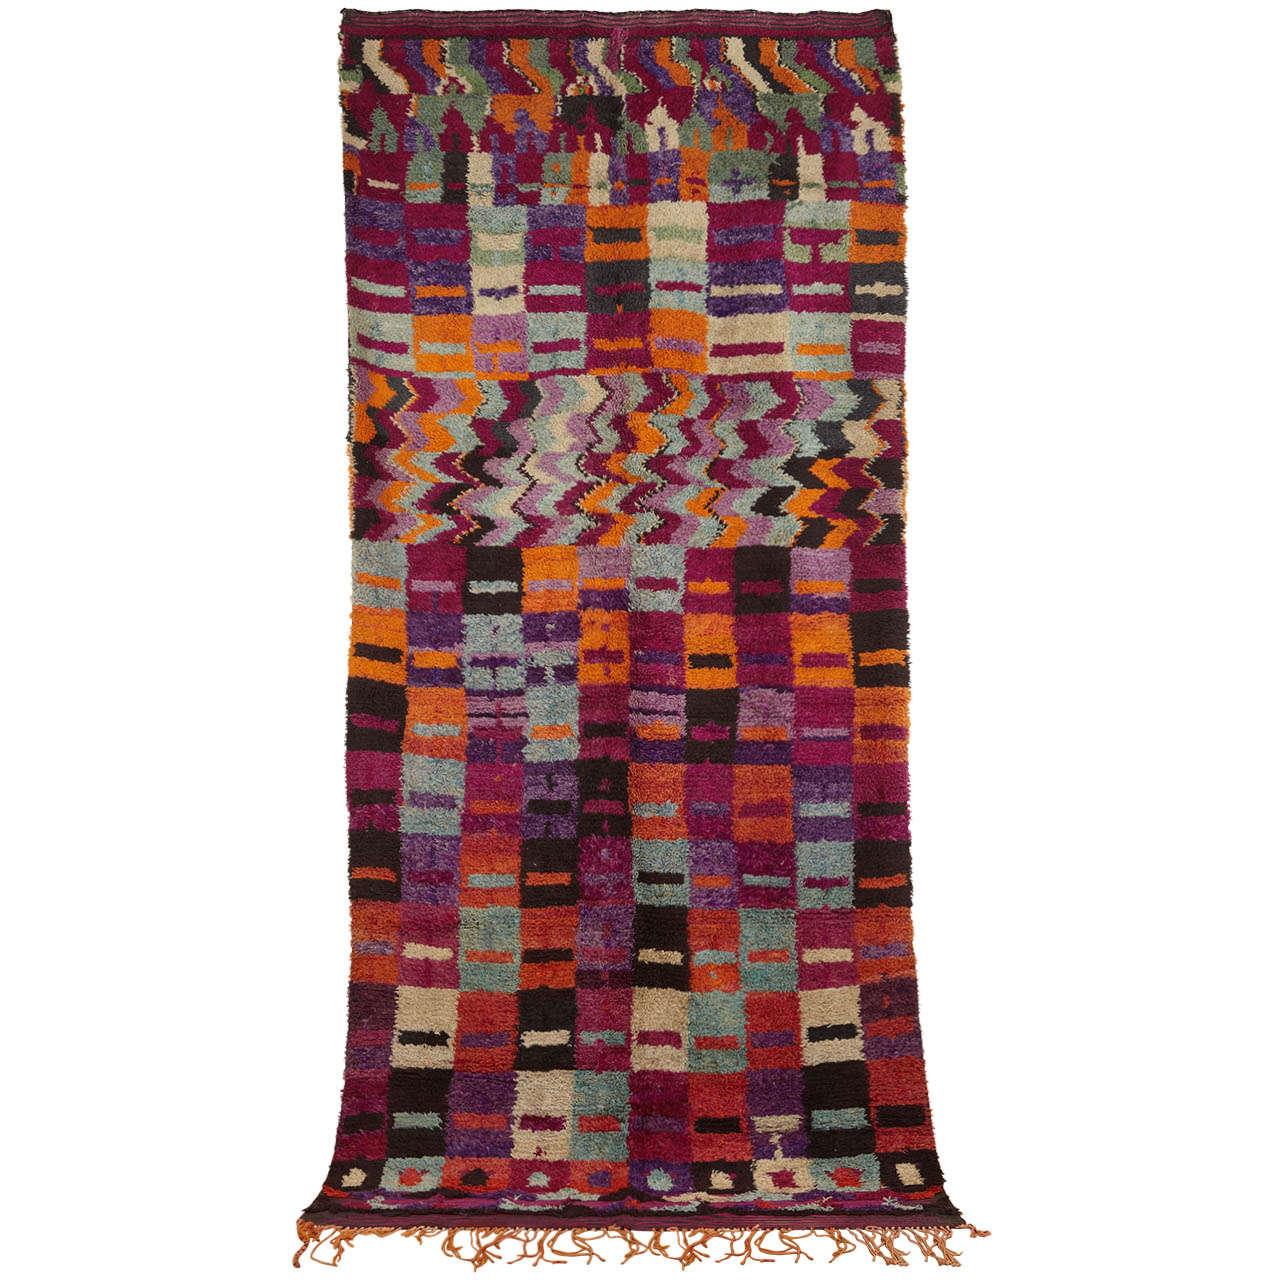 Eastern Moroccan Vintage Abstract Berber Rug